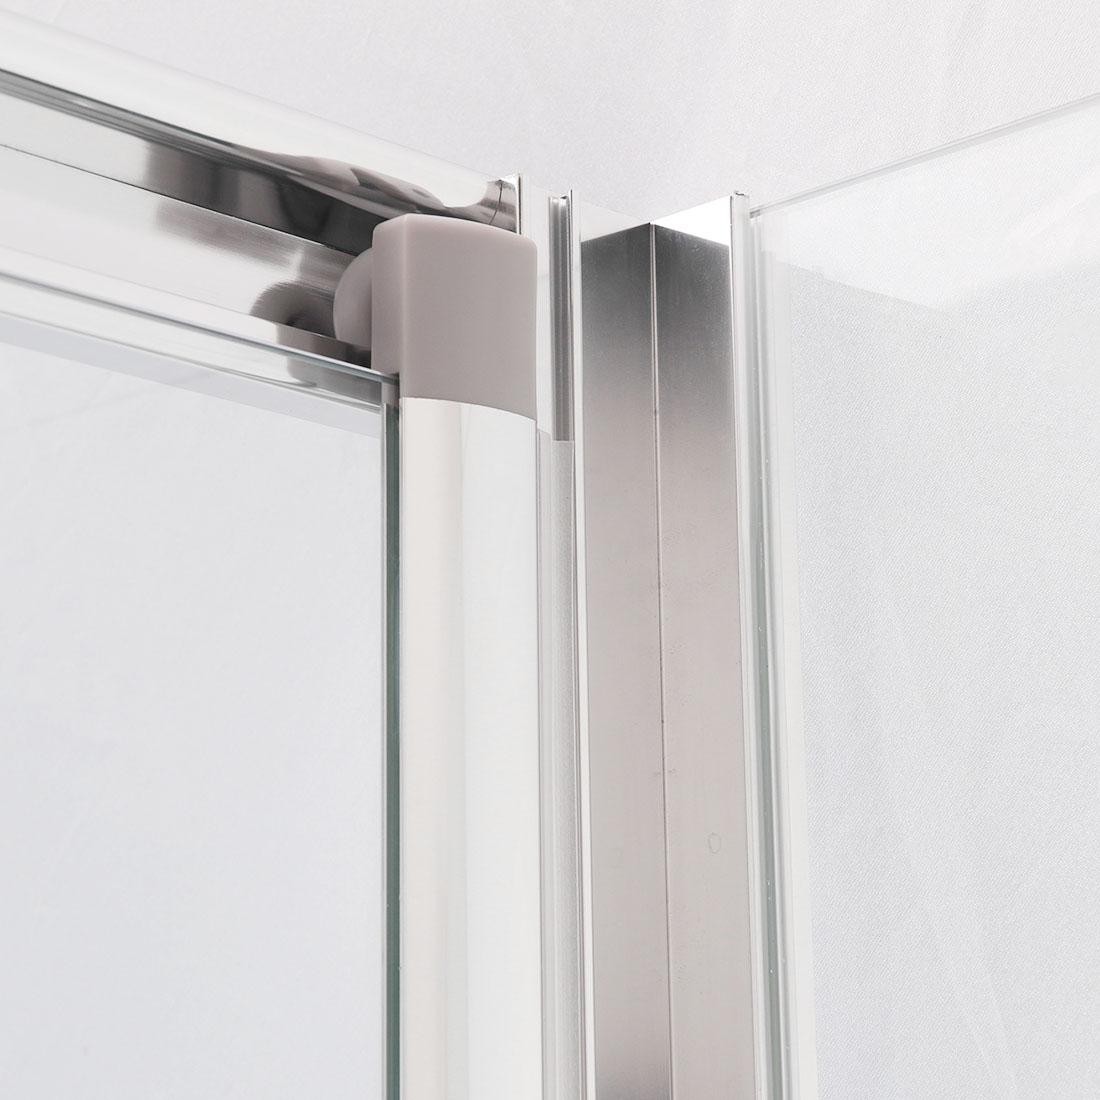 Walk In Shower Enclosure And Tray Bi Fold Hinge Pivot